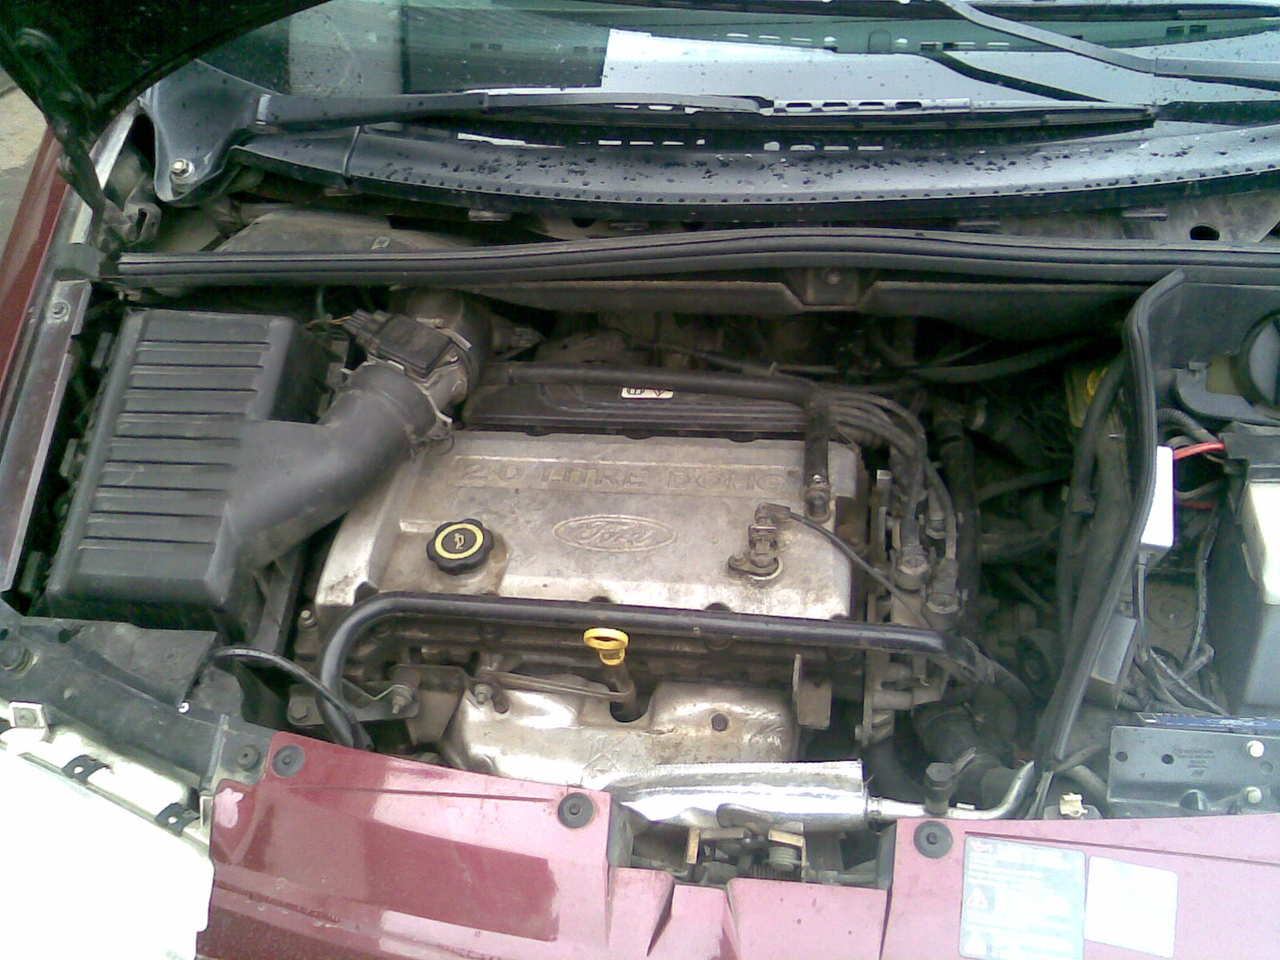 1999 Ford Galaxy Pics 2 0 Gasoline Ff Manual For Sale